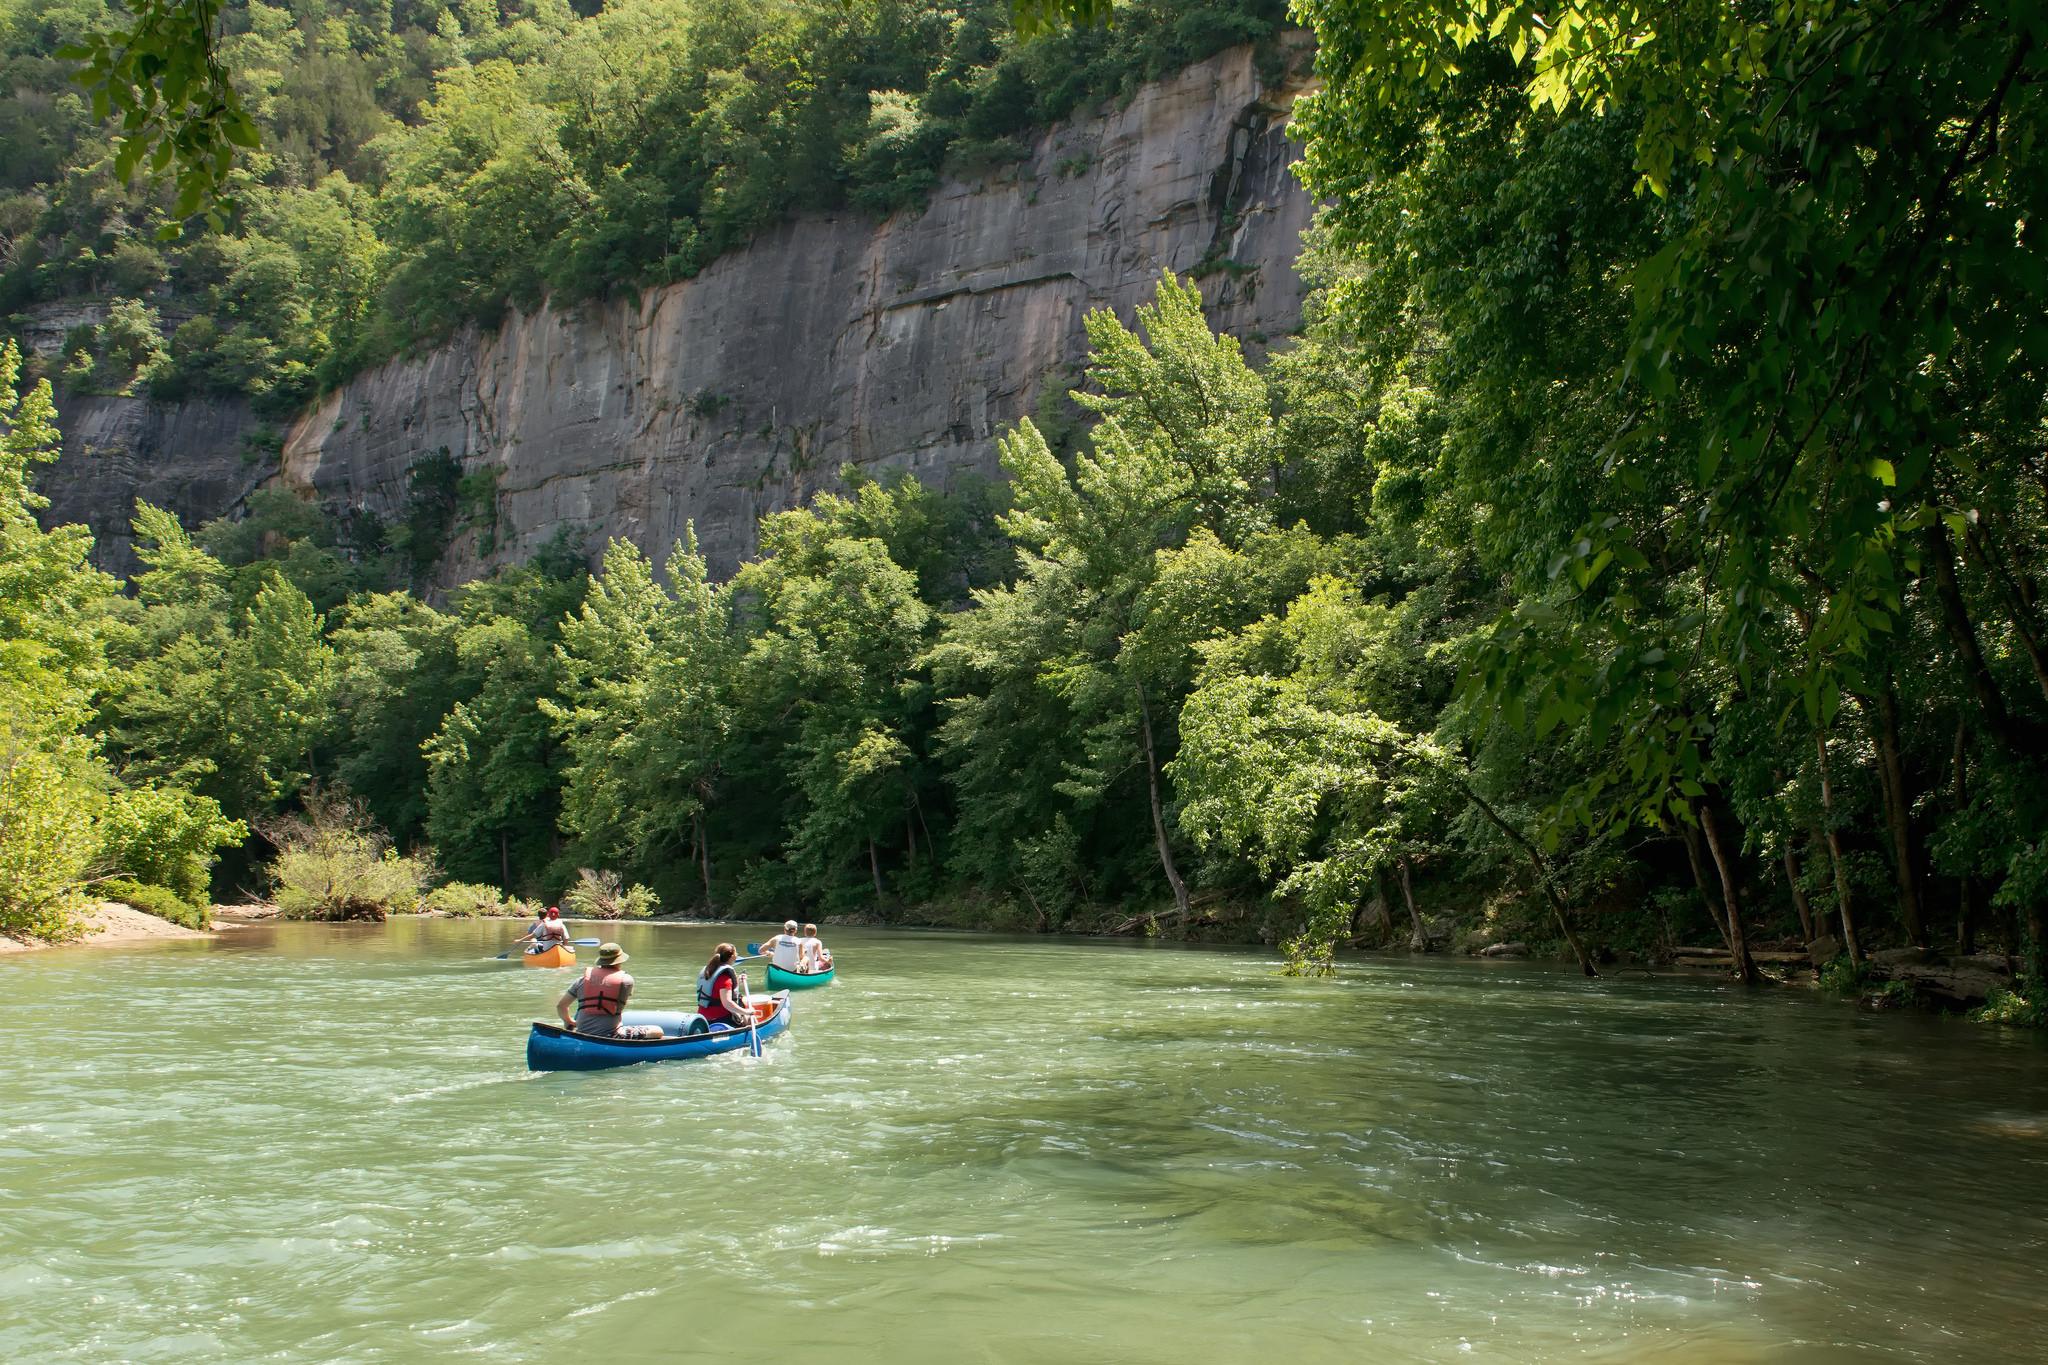 Canoeing the Buffalo River